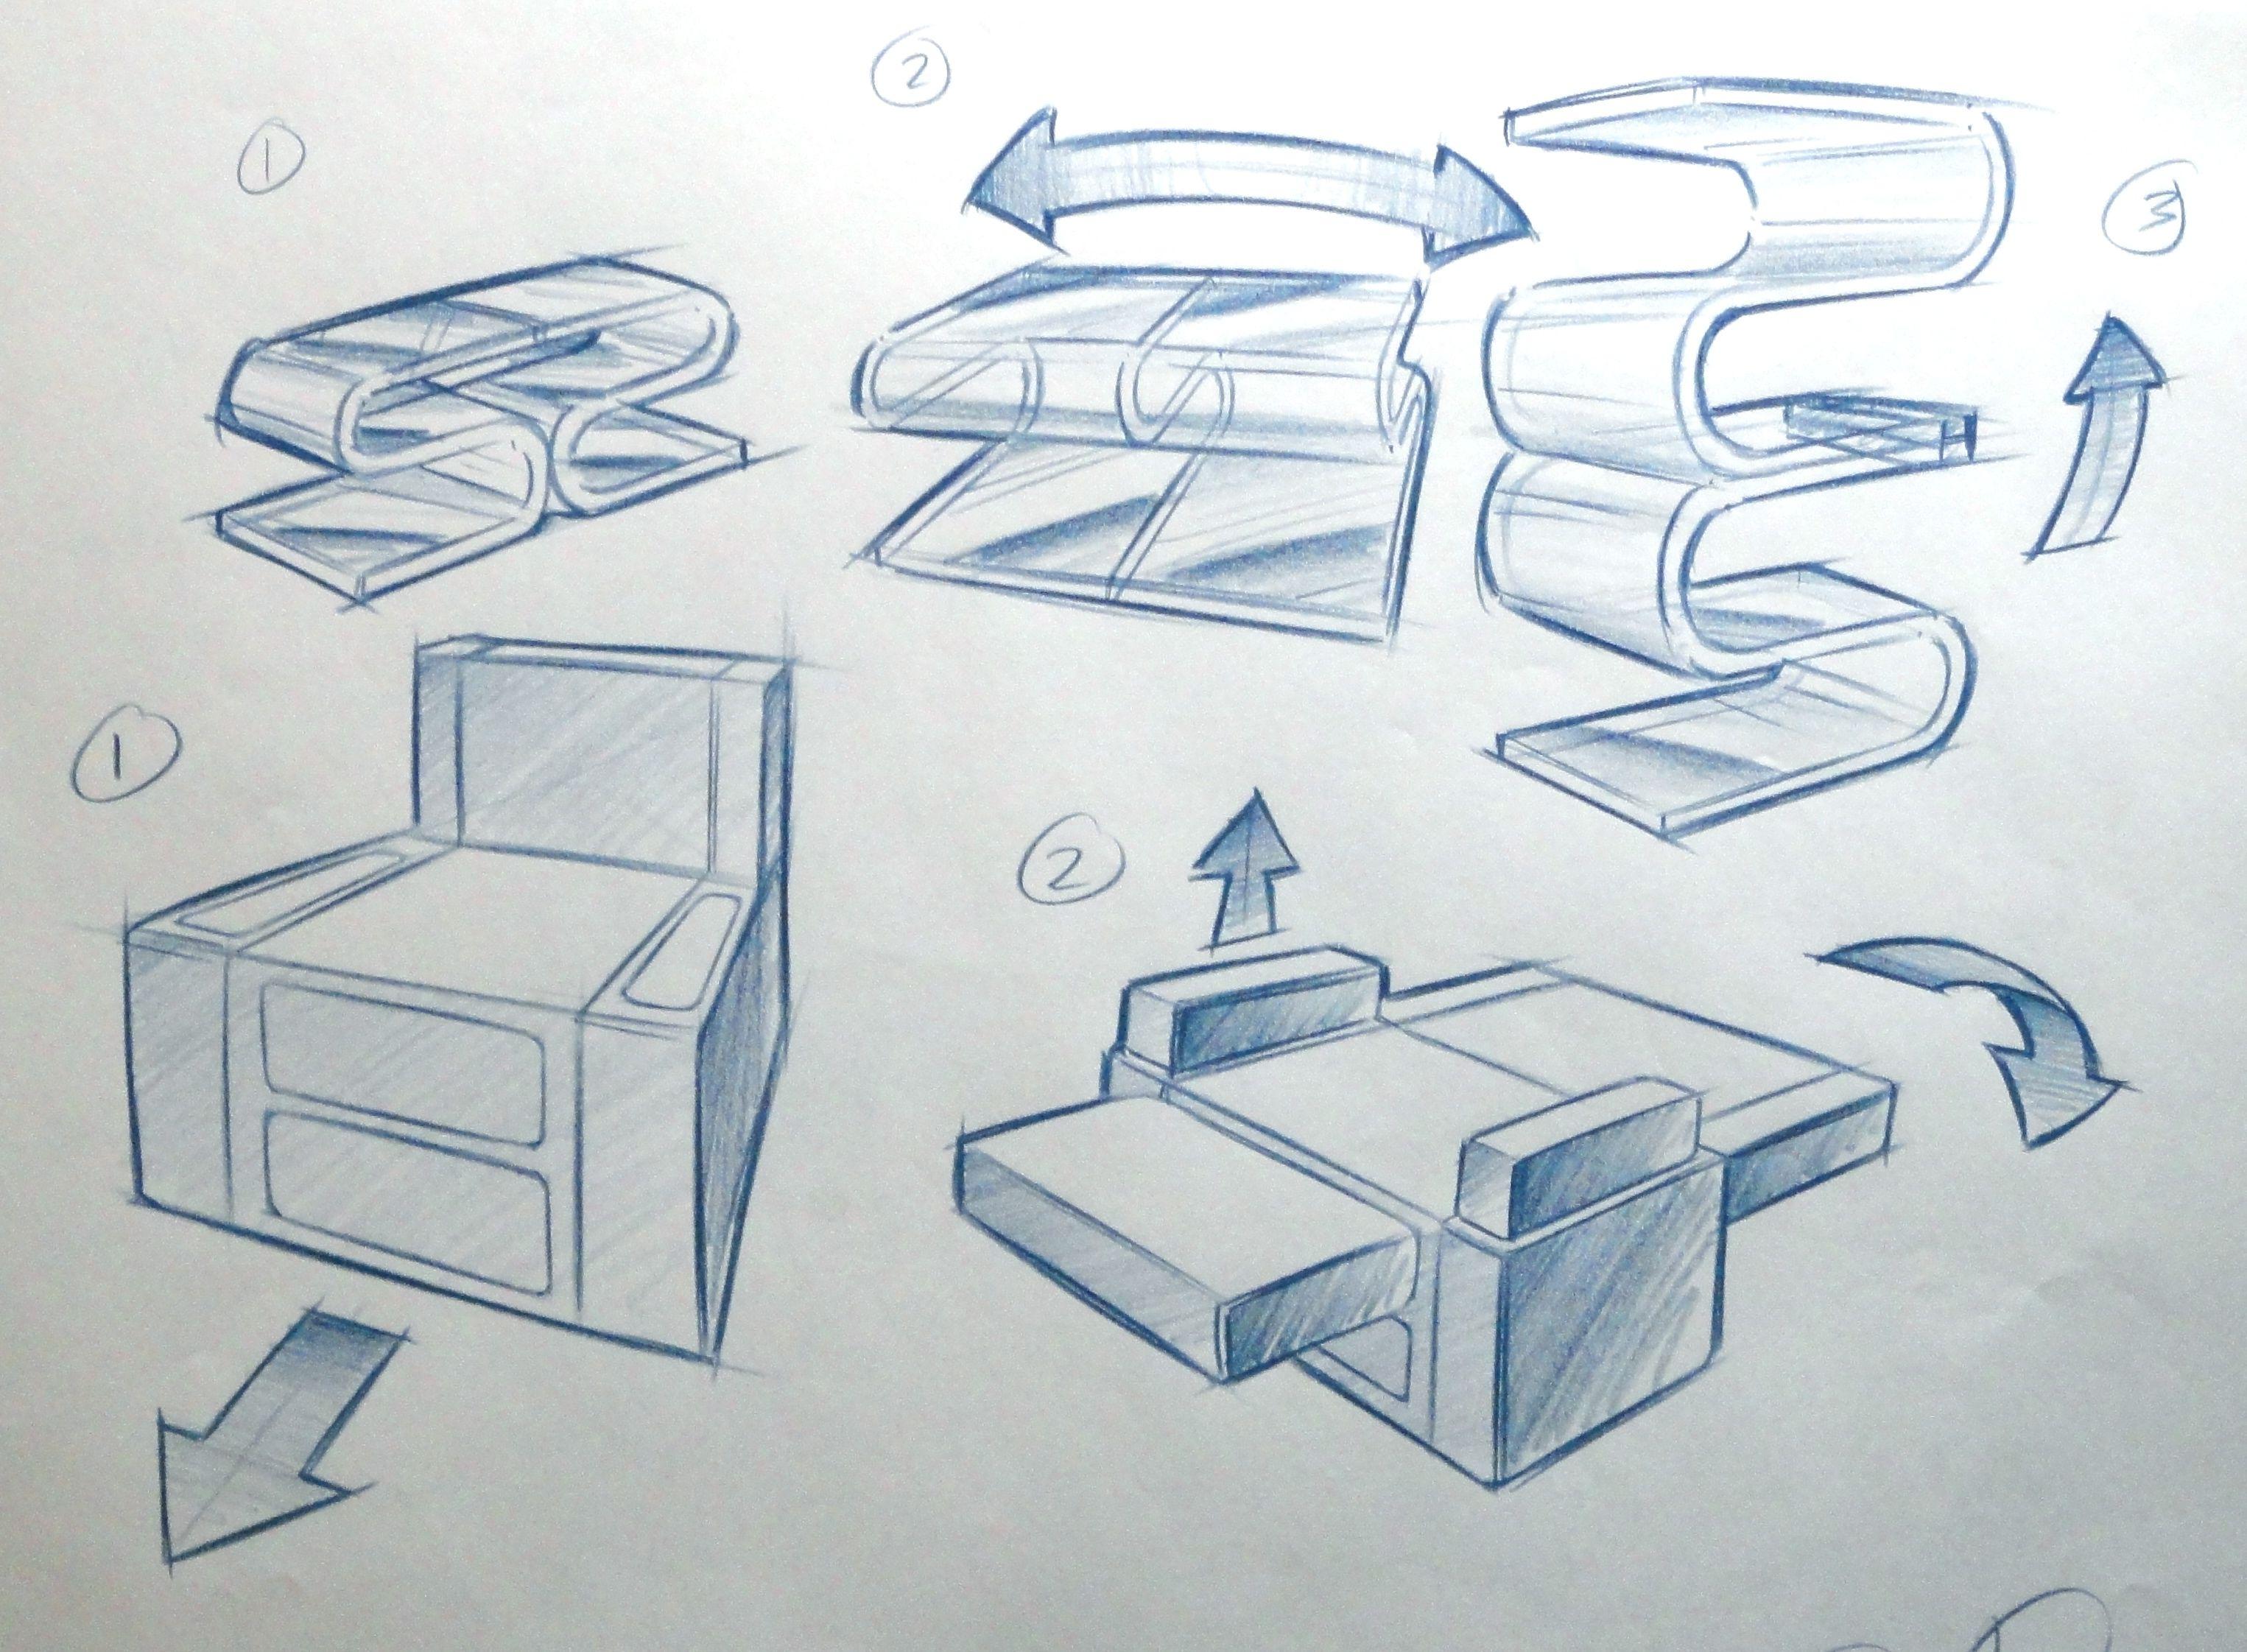 Transforming Furniture By Sean Peterson At Coroflot Com 스케치